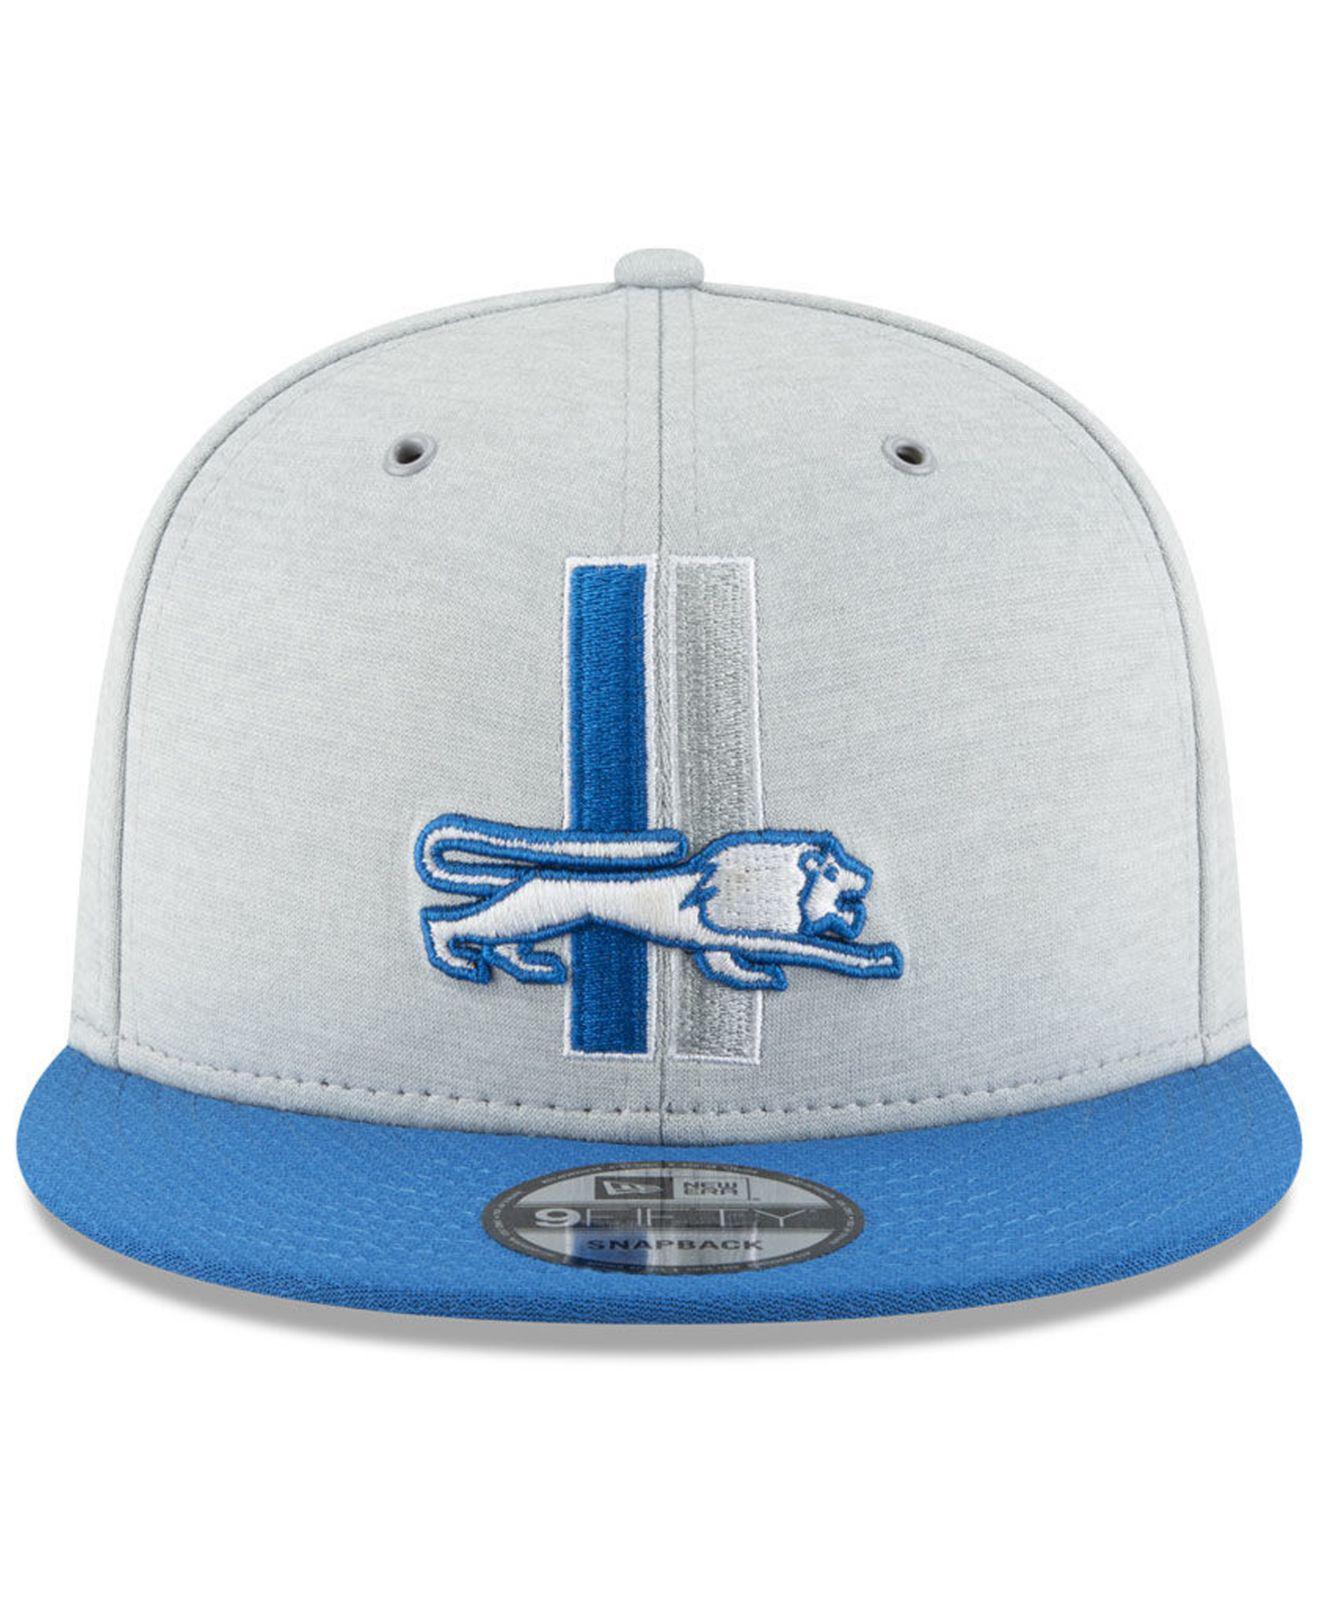 24407e120 Lyst - Ktz Detroit Lions On Field Sideline Home 9fifty Snapback Cap in Blue  for Men